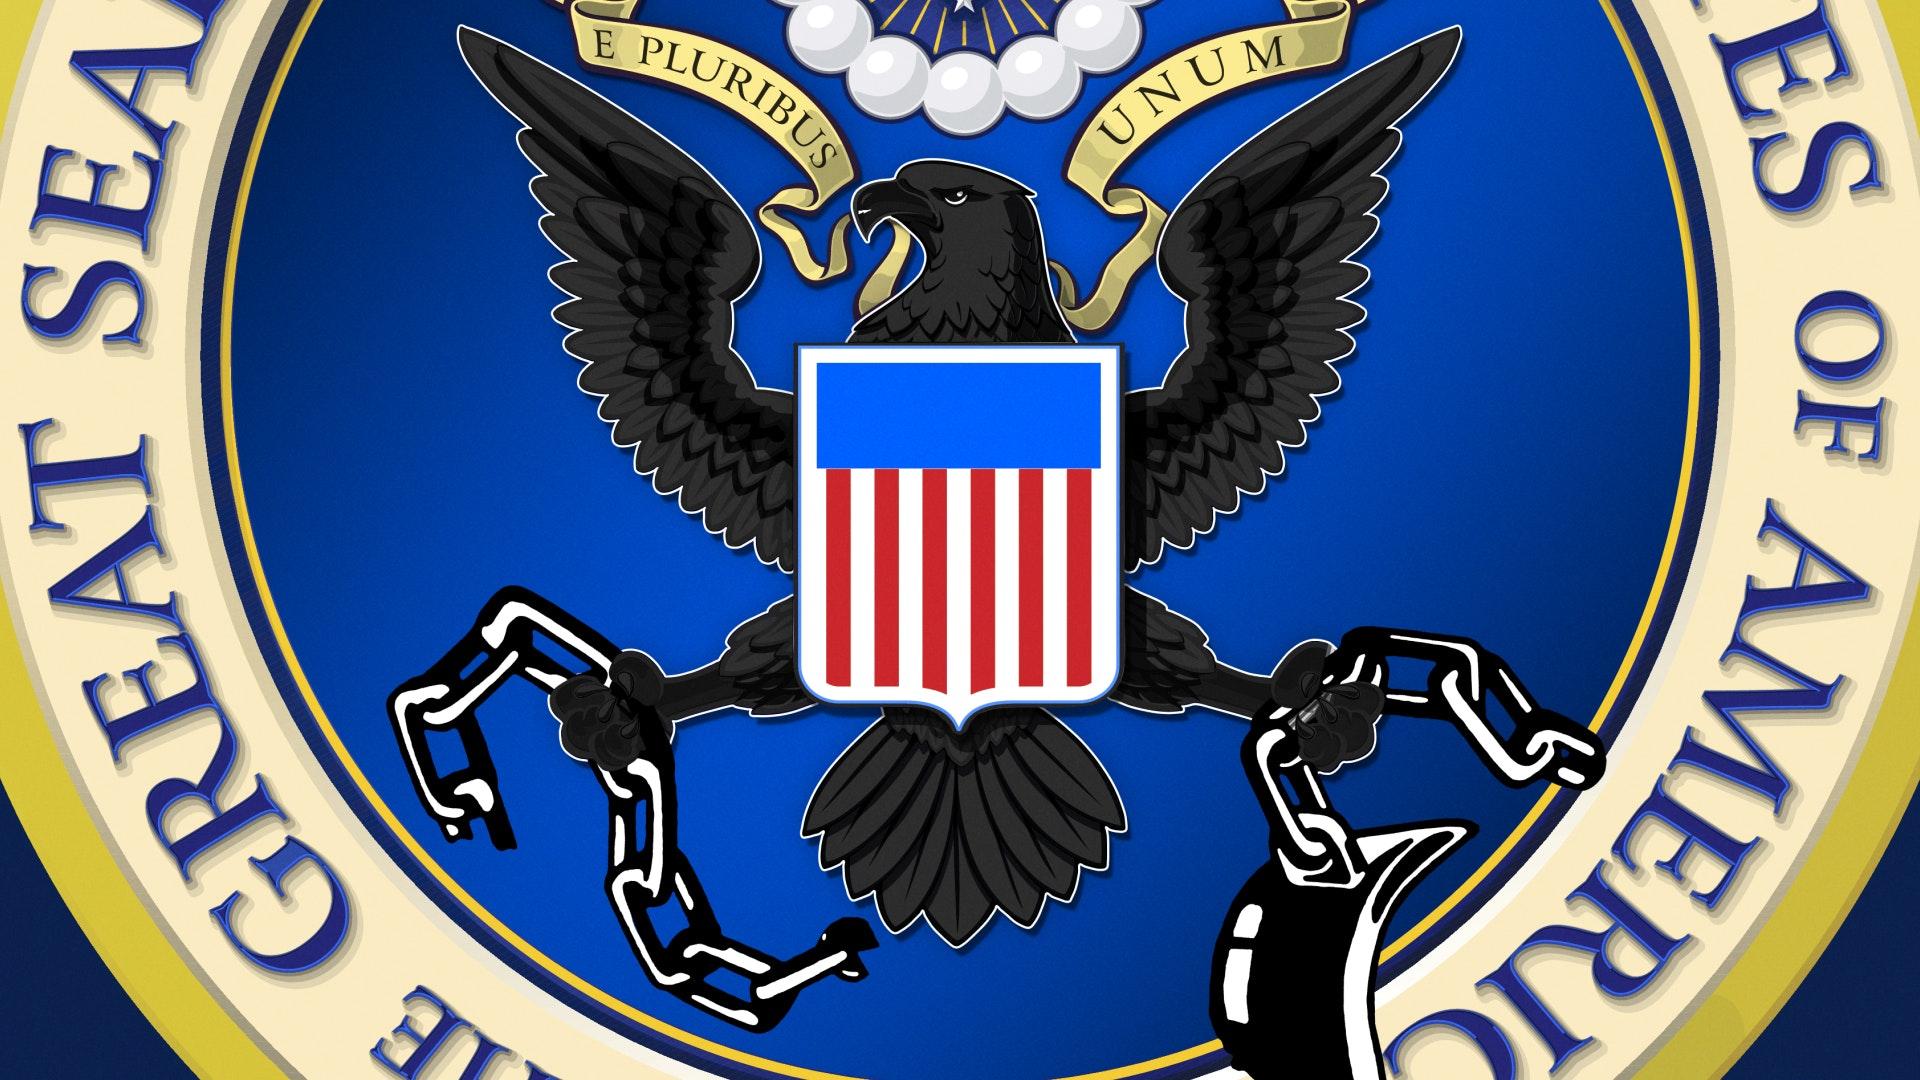 Ep. 1236 - Team Biden Thinks America Sucks